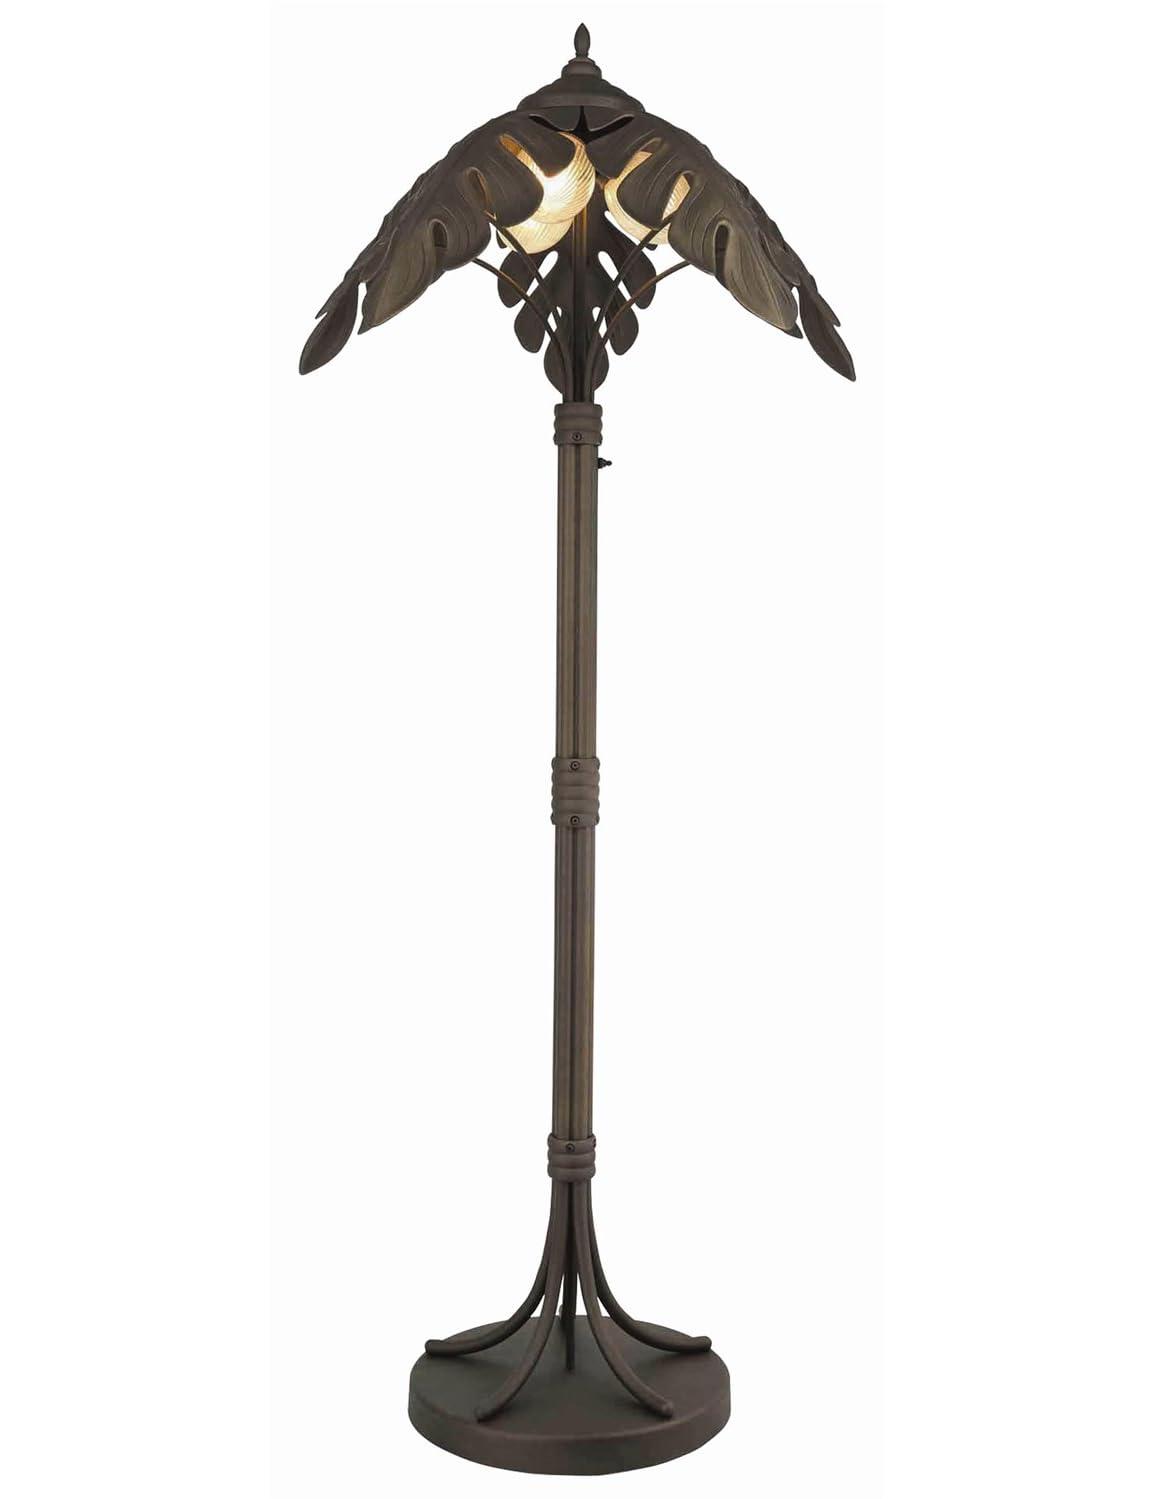 Cast iron outdoor palm tree lamp post light floor lamp for Landscape lighting lamps